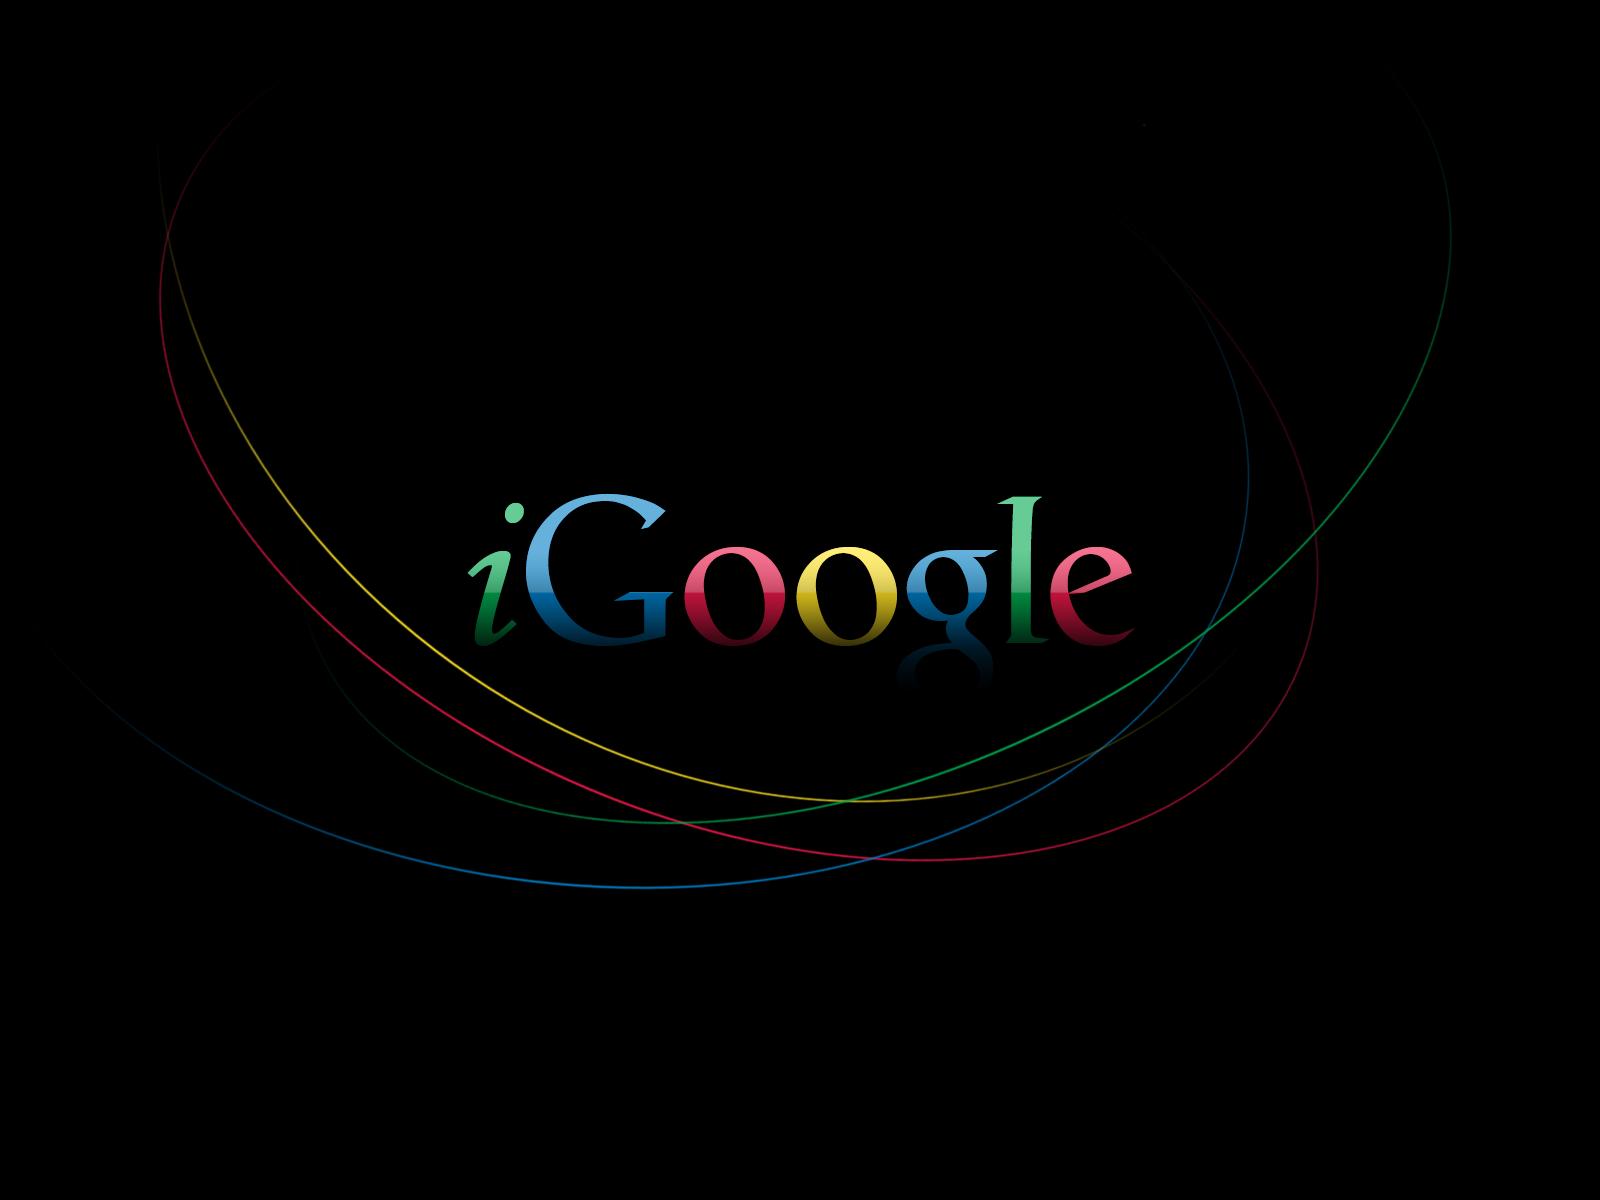 Wallpapers HD Google 1600x1200